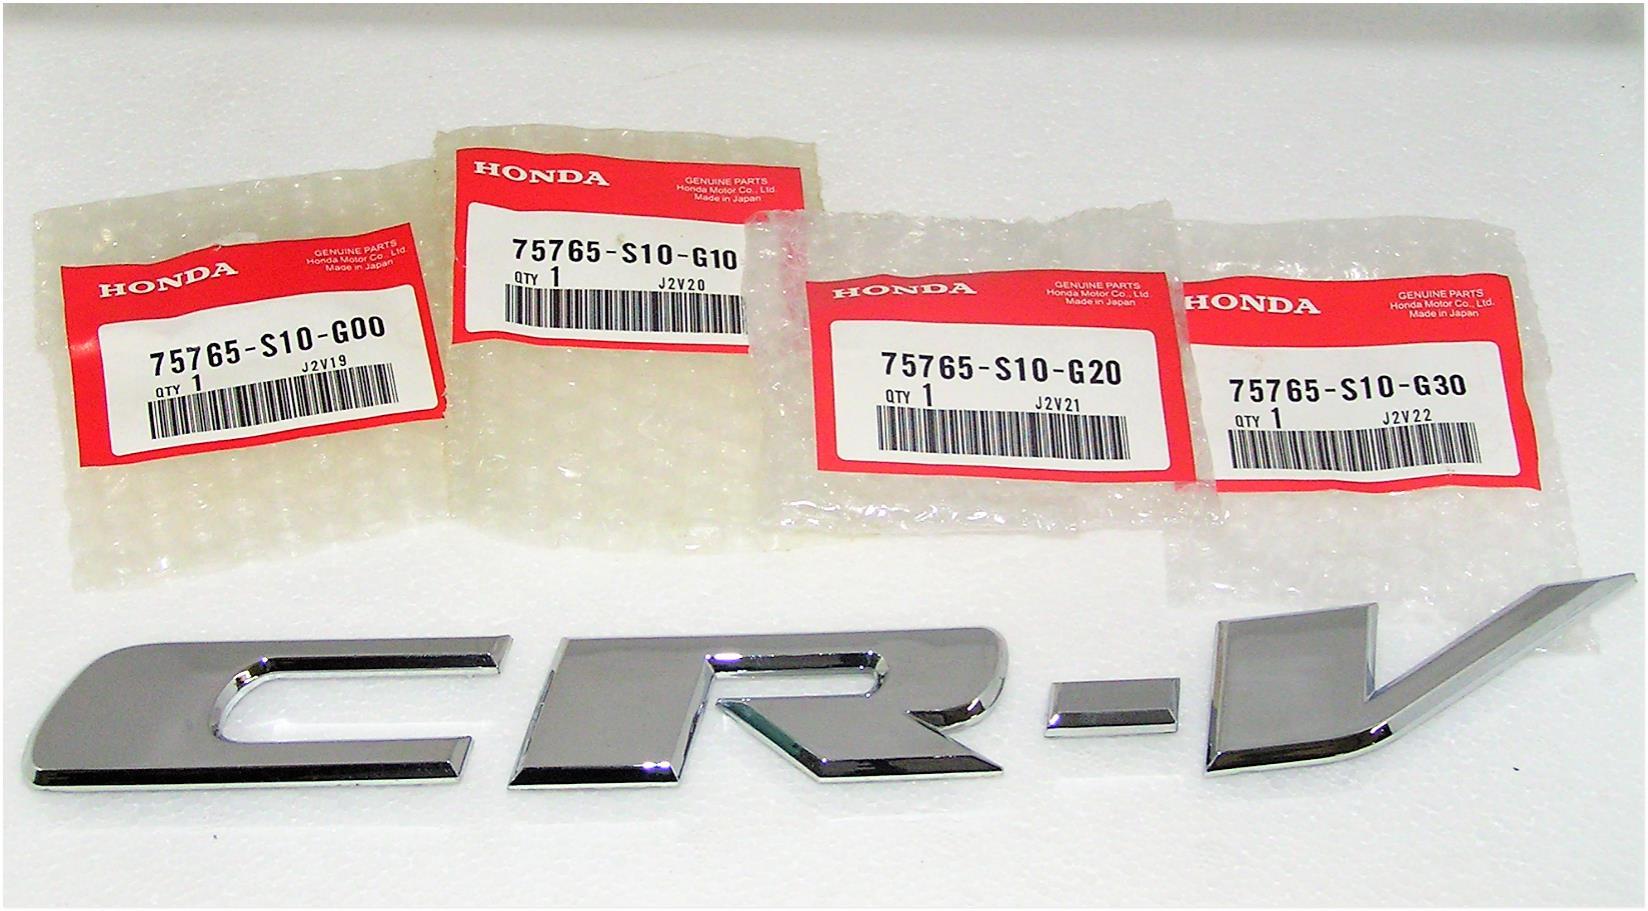 3046602 Honda Crv Badge 1997 200 End 9 19 2019 1215 Am 2001 Parts Oem Accessories Exterior Body 75765 S10 G00